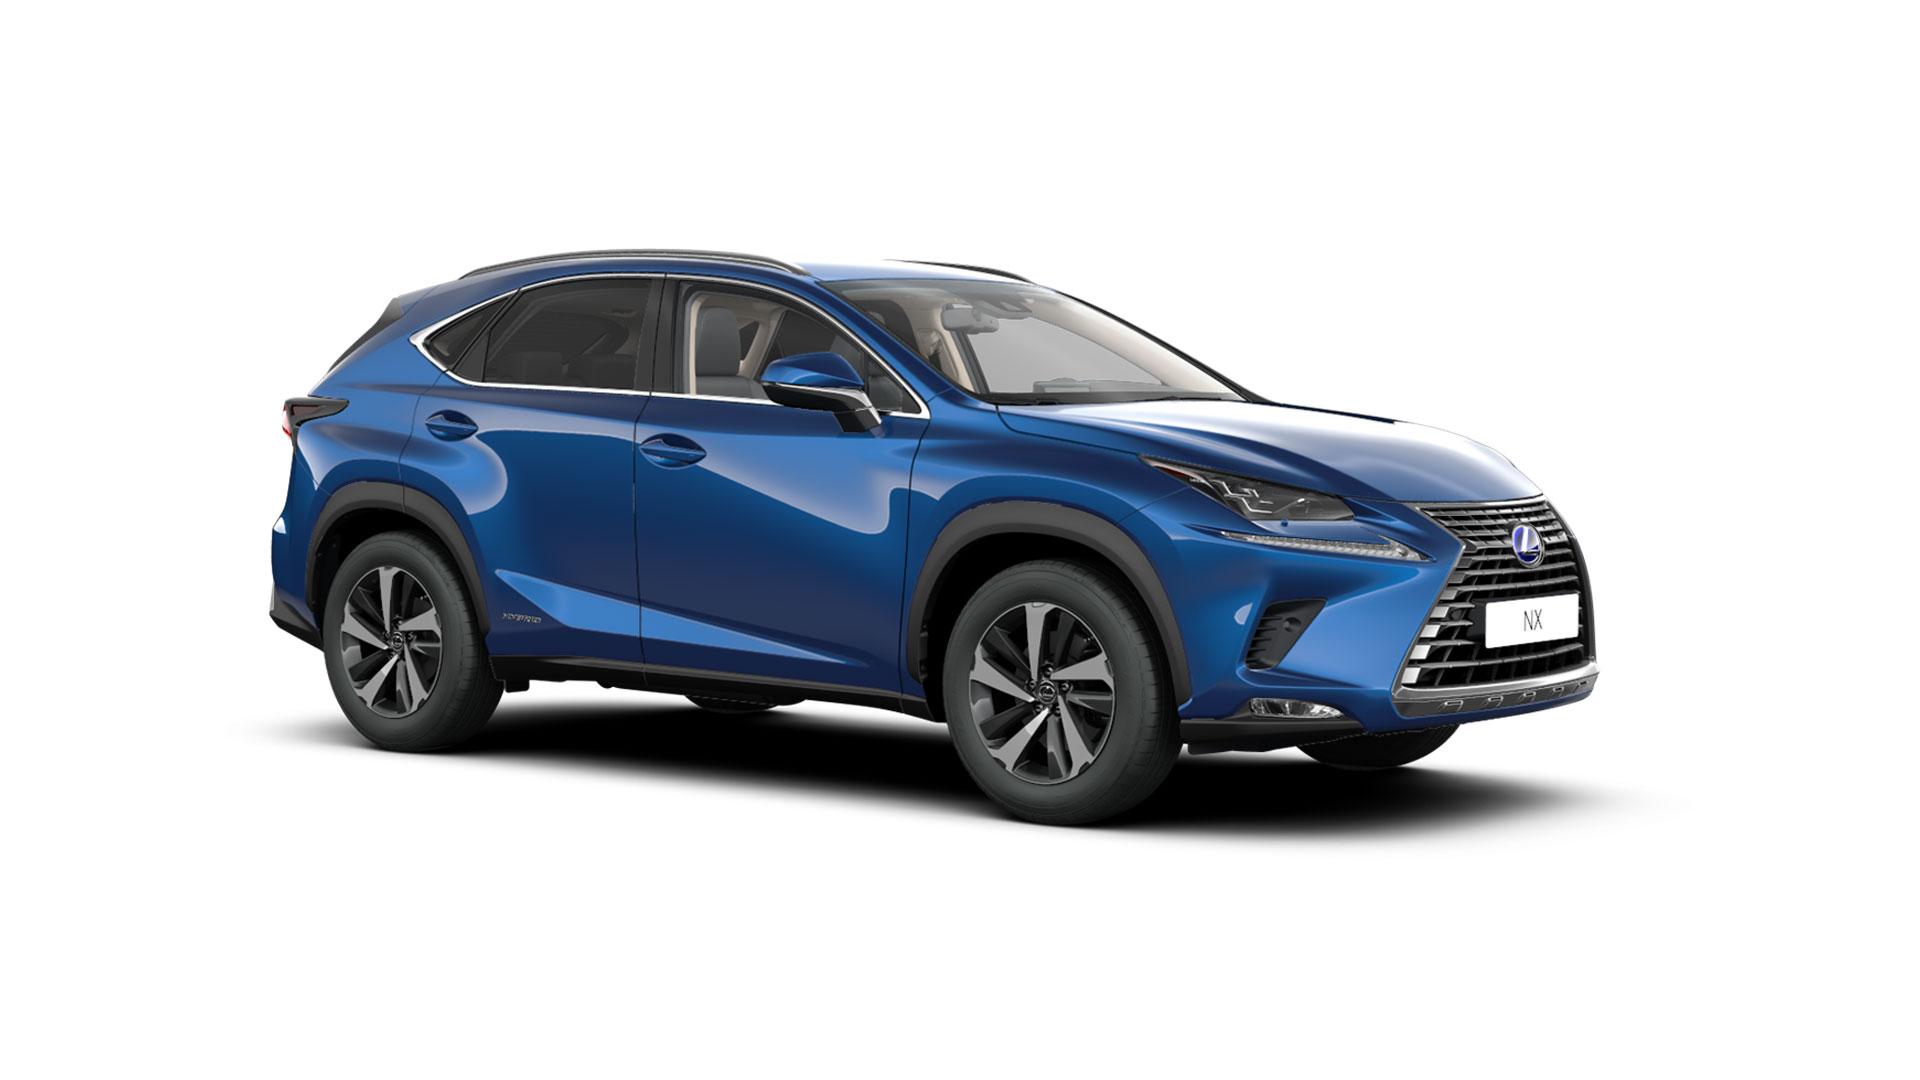 2017 lexus hybrid for business meet the nx ccis